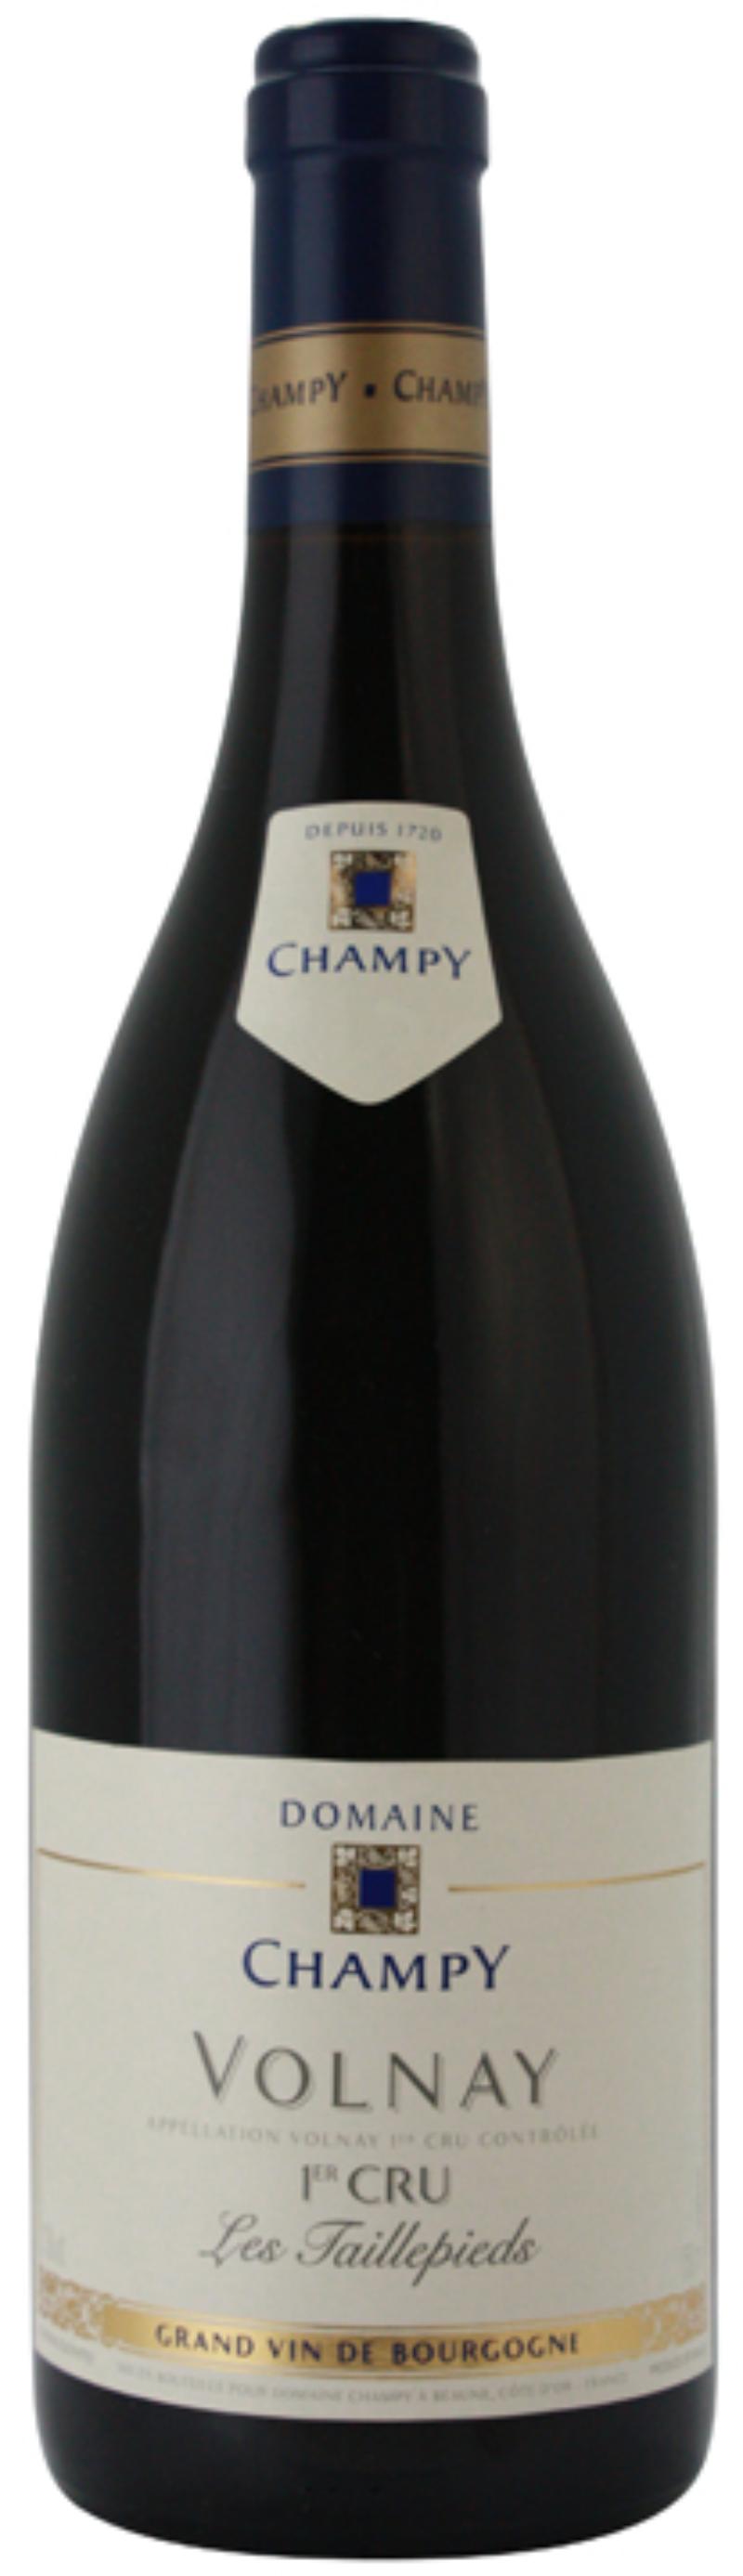 VOLNAY-1ER-CRU-LES-TAILLIPIEDS-CHAMPY-2007